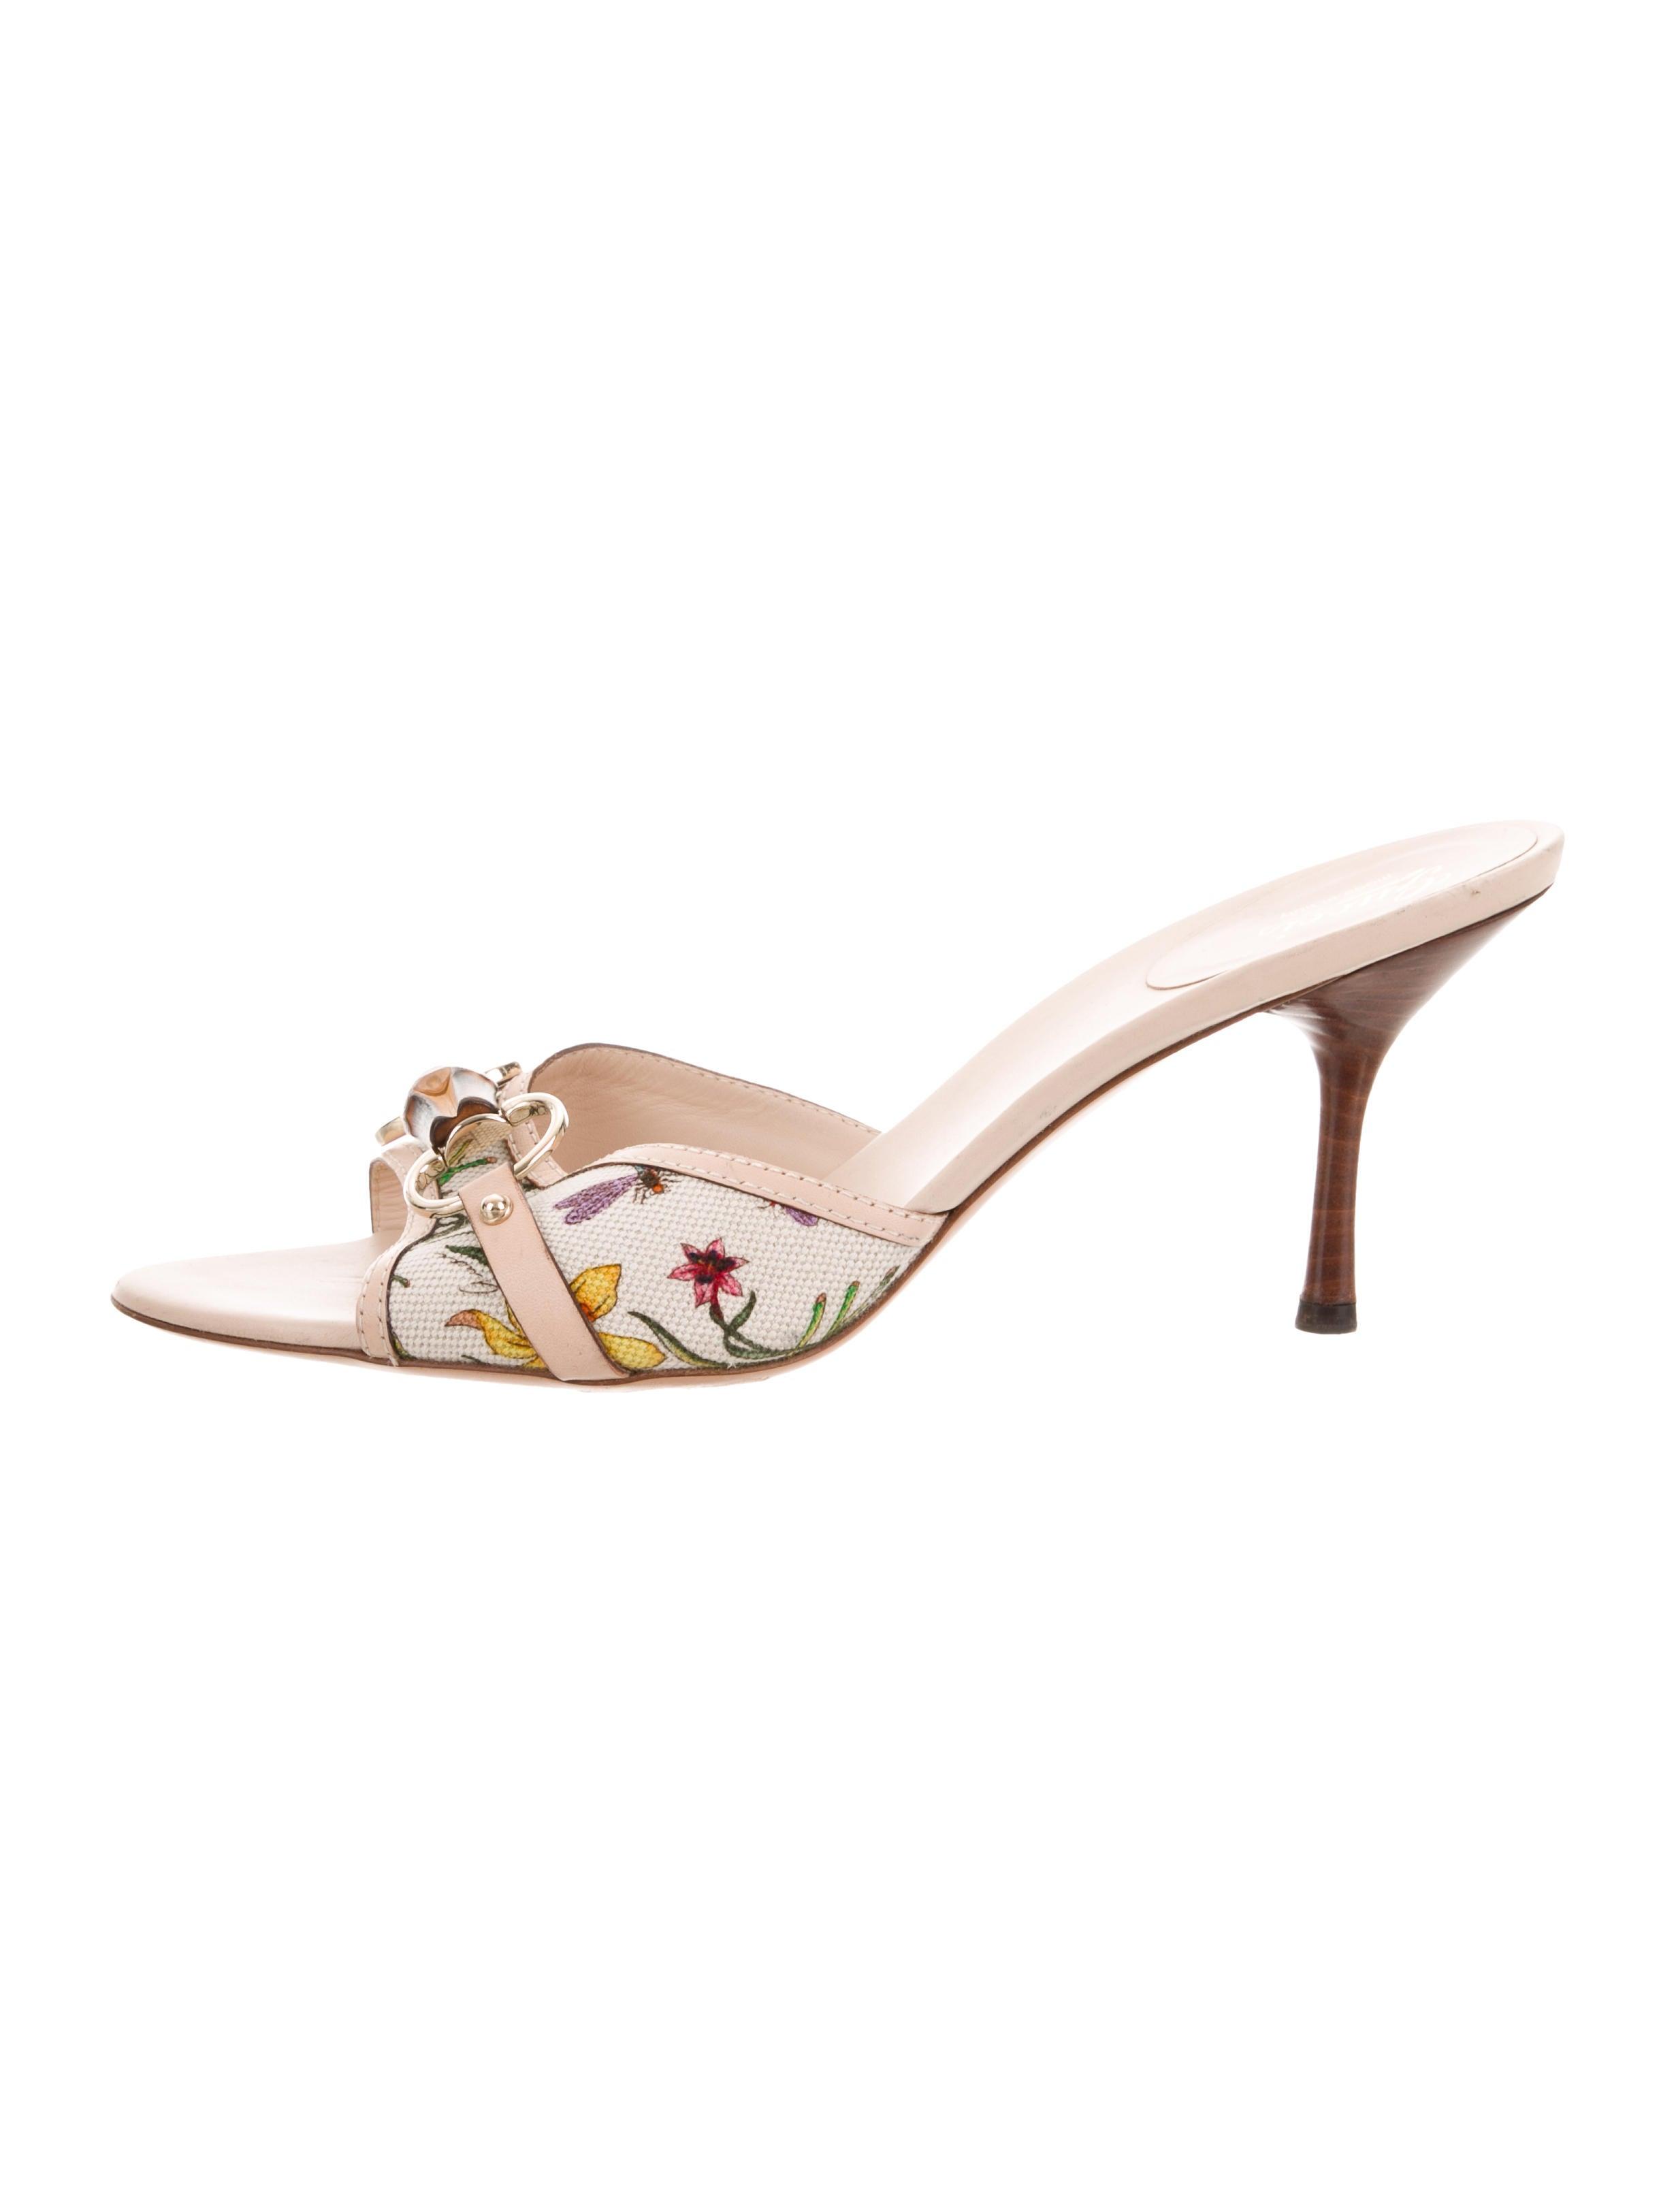 16c7671c5 Gucci Flora Bamboo Horsebit Mules - Shoes - GUC231656 | The RealReal